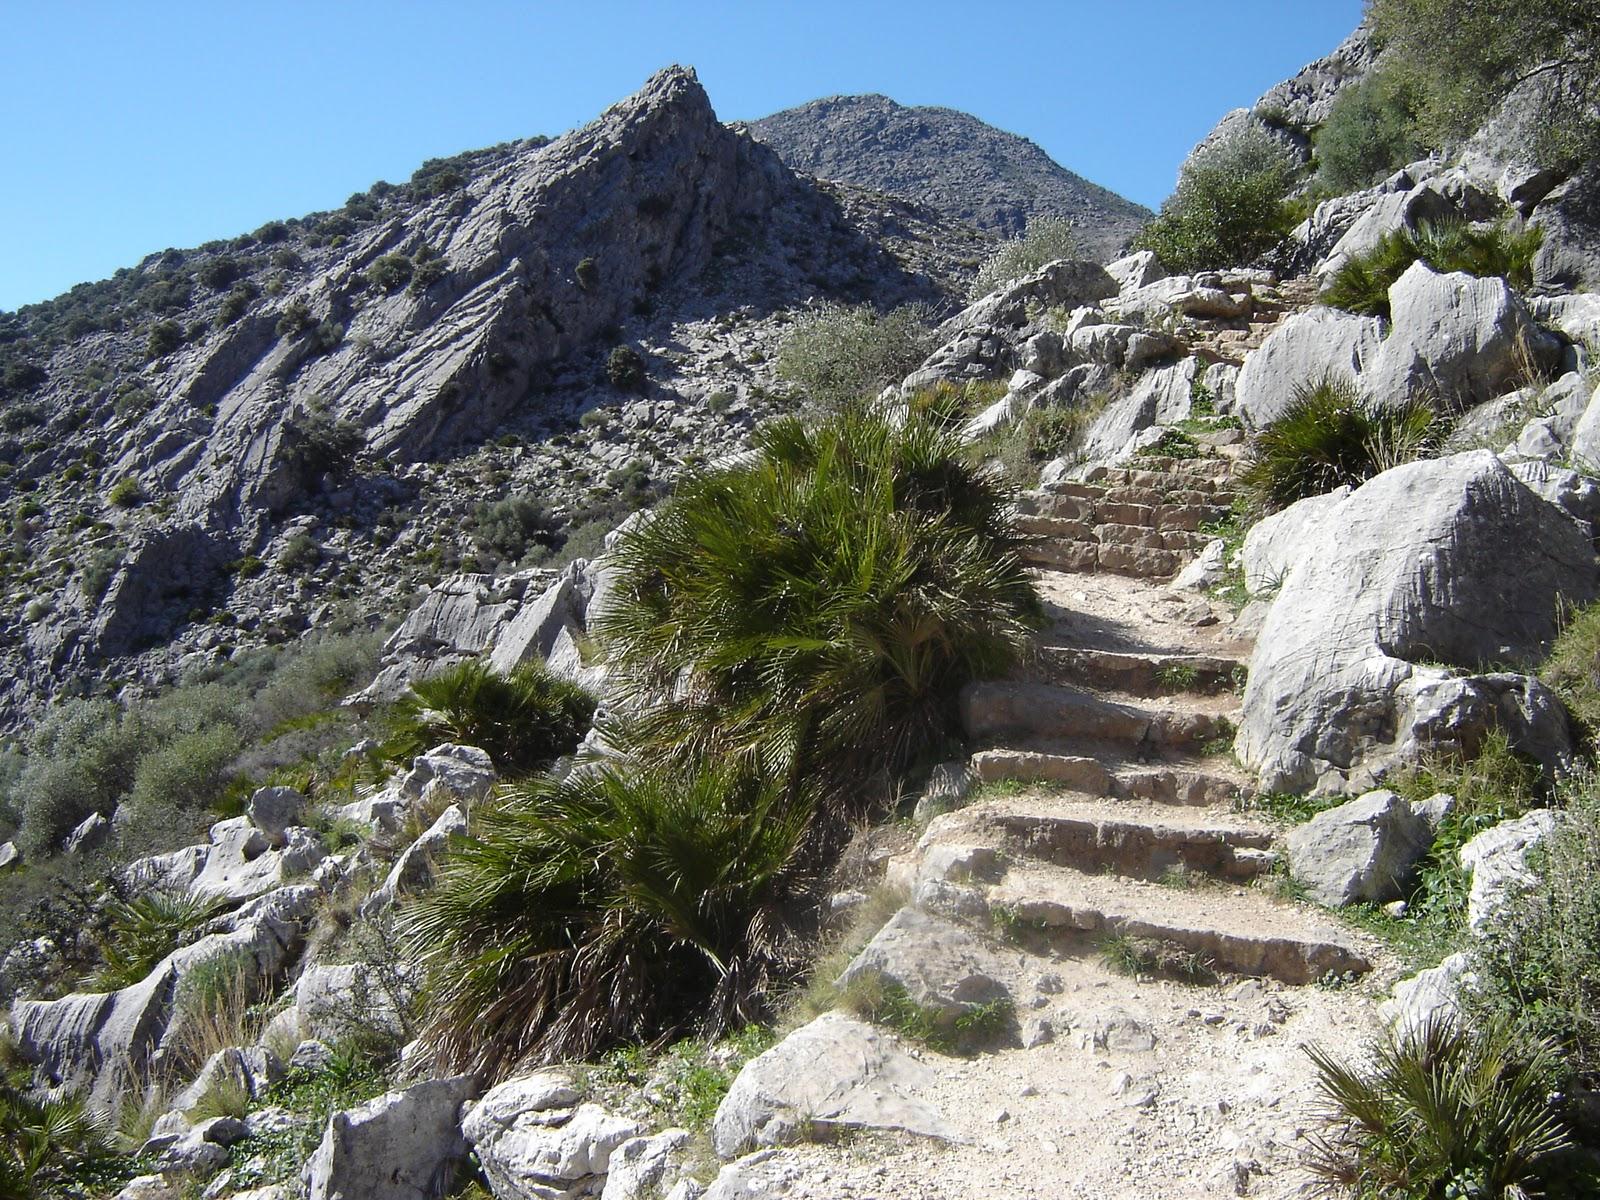 Postcards from Spain: Cueva de la Pileta & Benaoján (Serranía de Ronda)